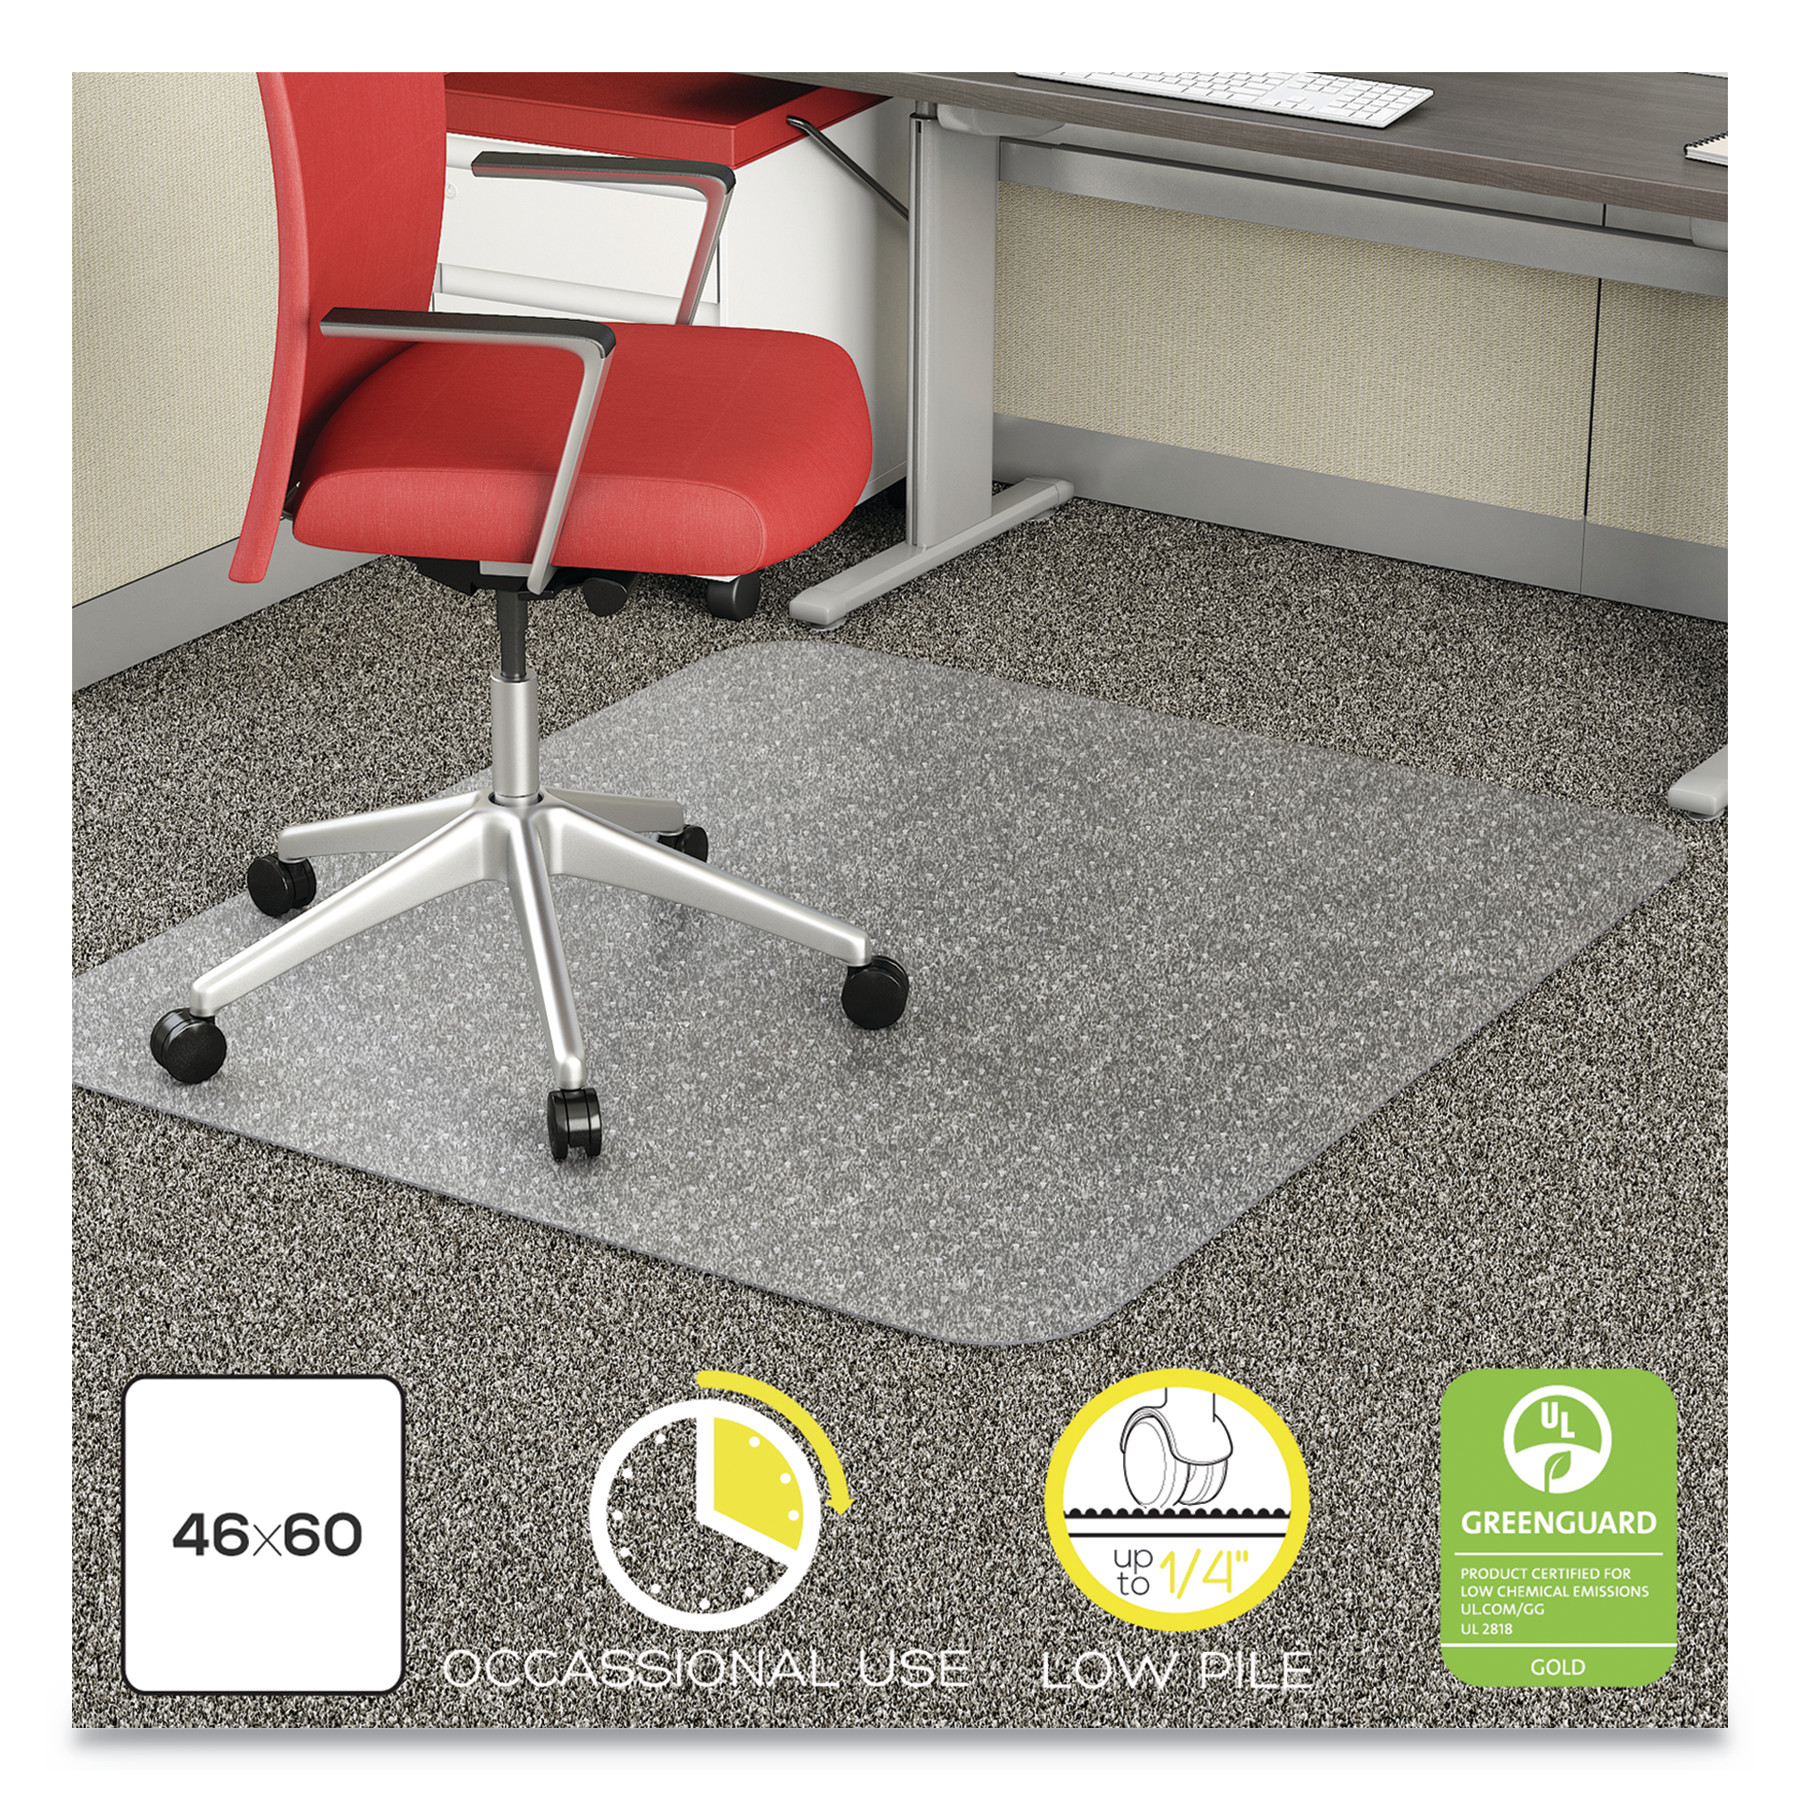 deflecto EconoMat Occasional Use Chair Mat, Low Pile Carpet, Roll, 46 x 60, Rectangle, CR -DEFCM11442FCOM